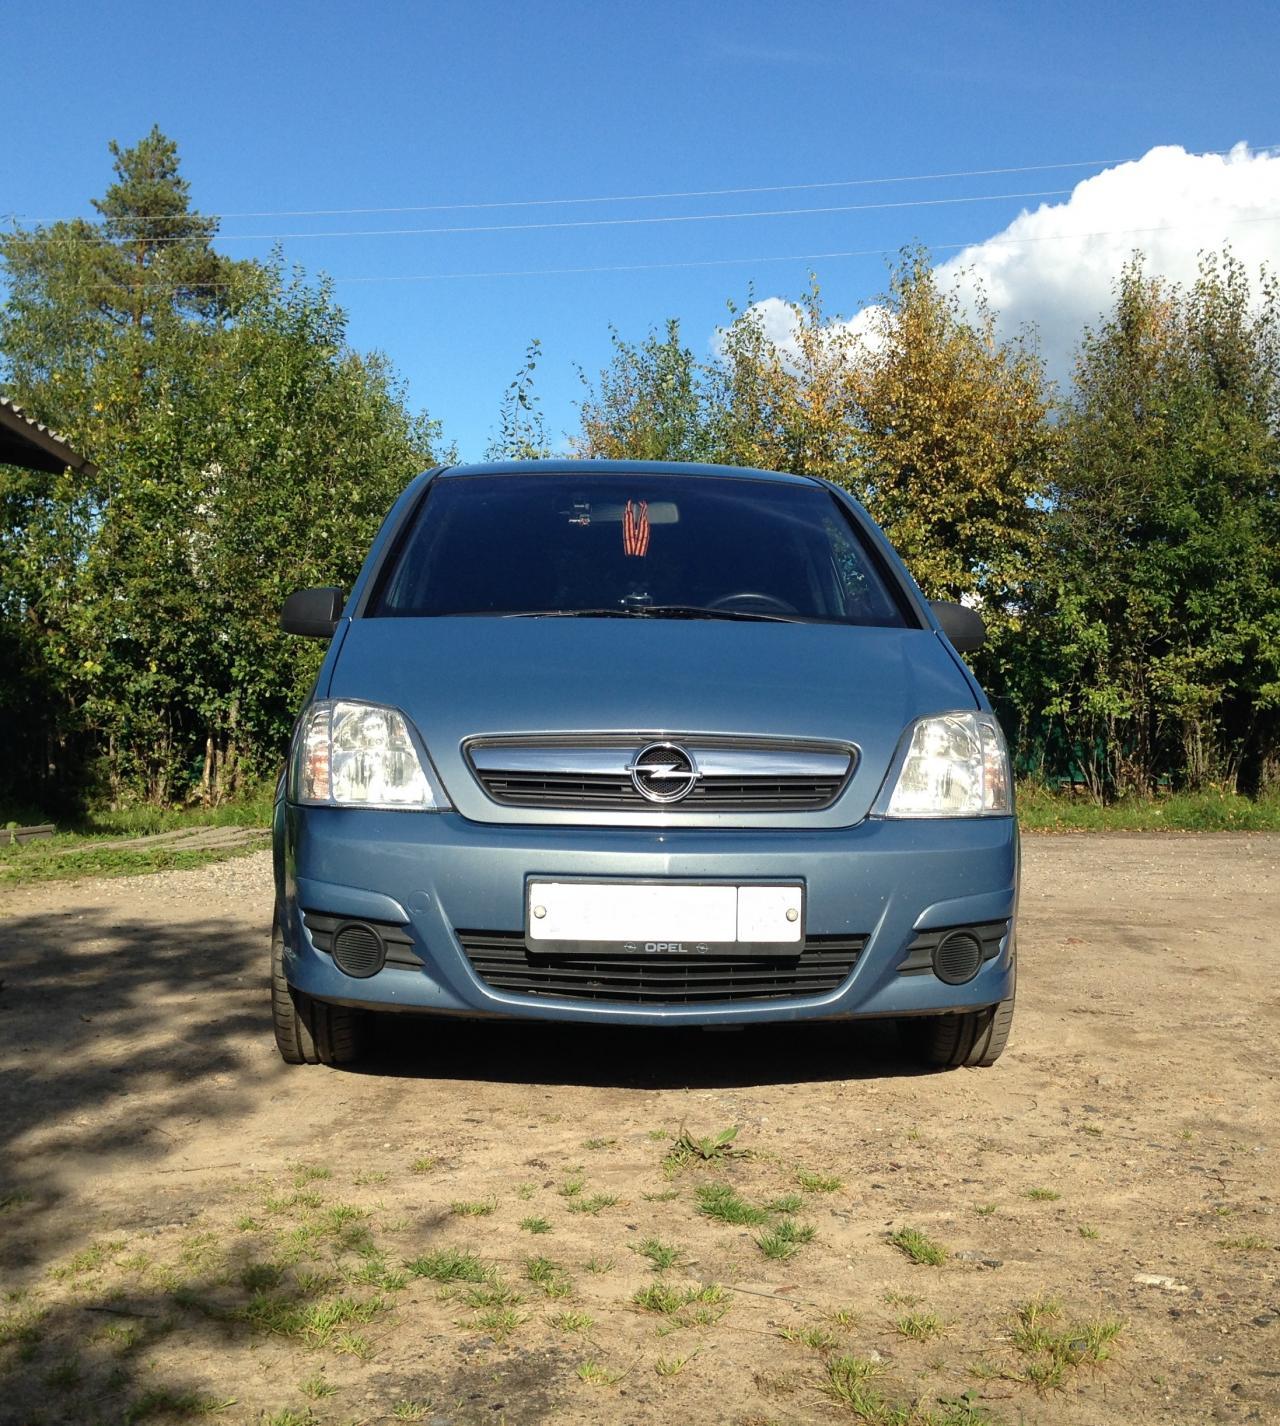 Opel Meriva 2007 г.в. г.Архангельск - фото 2